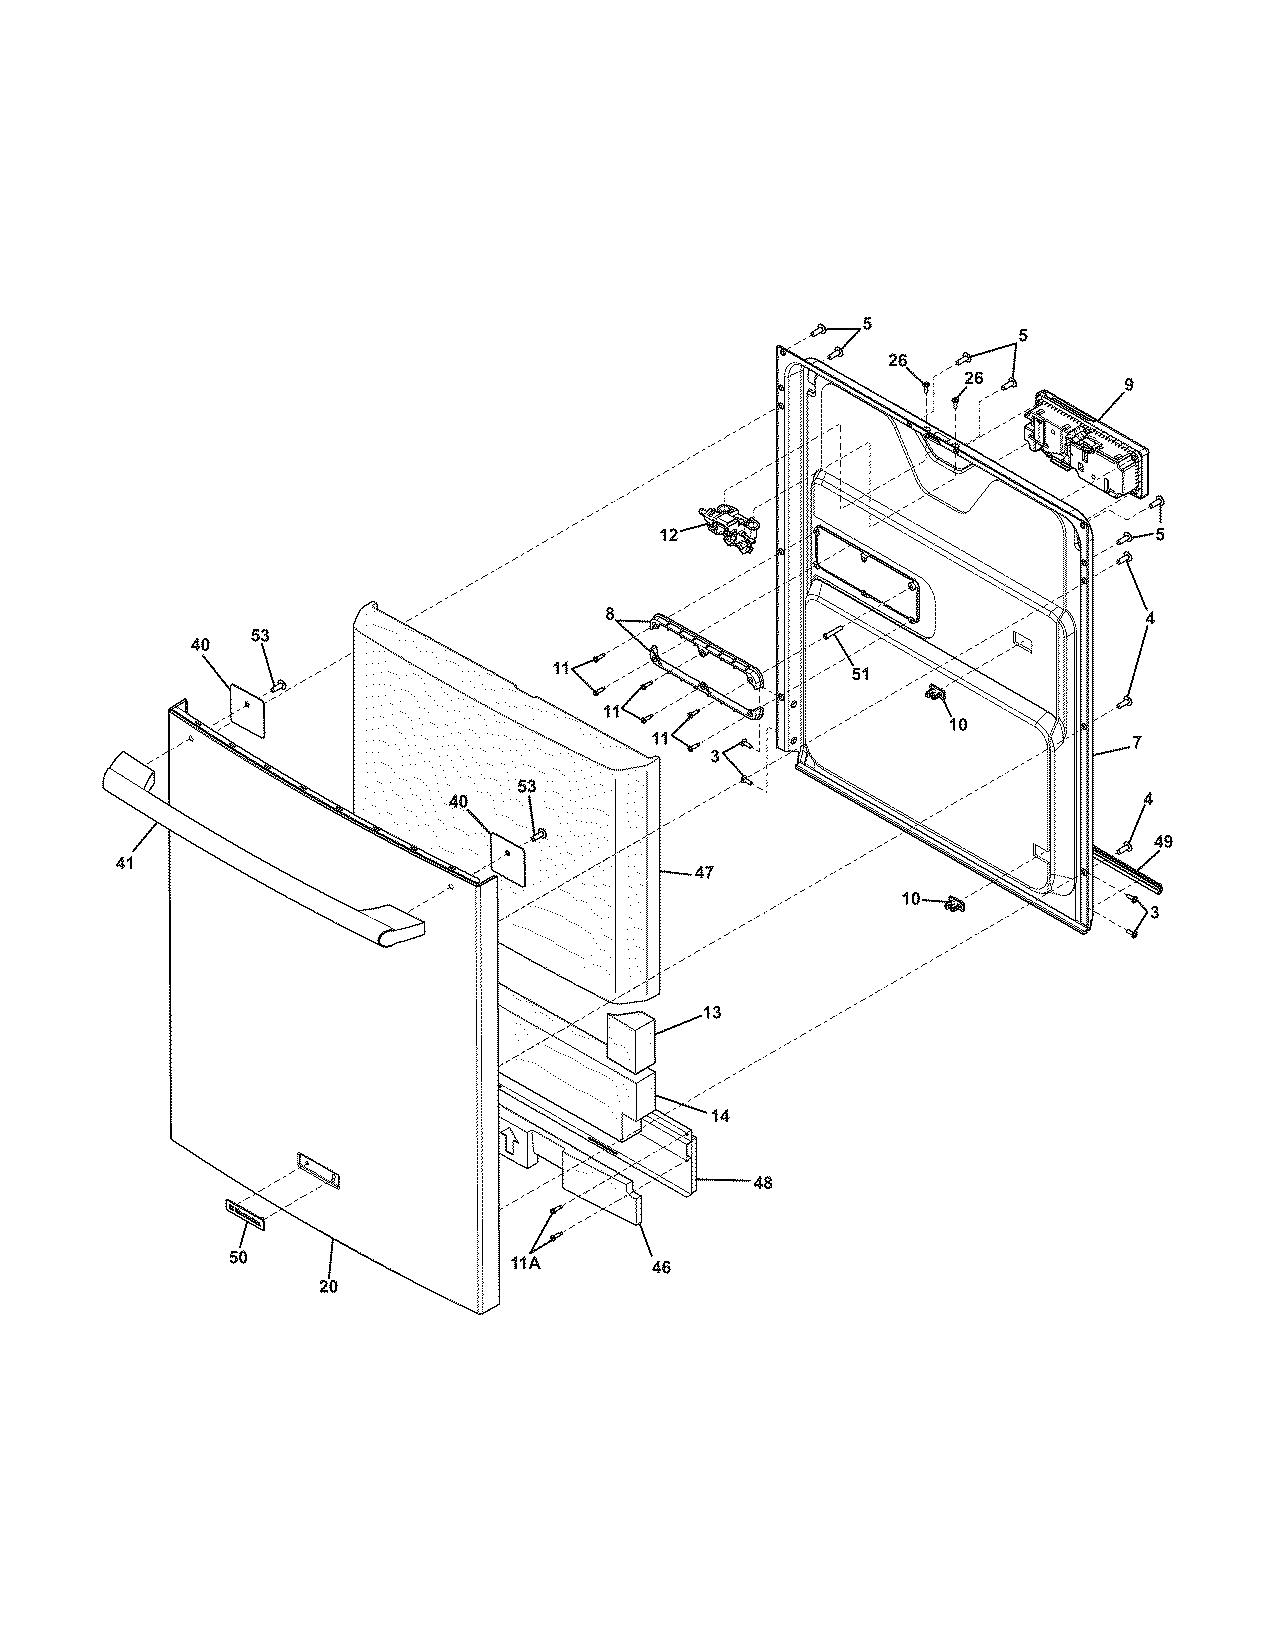 Holden Ve Iq Wiring Diagram